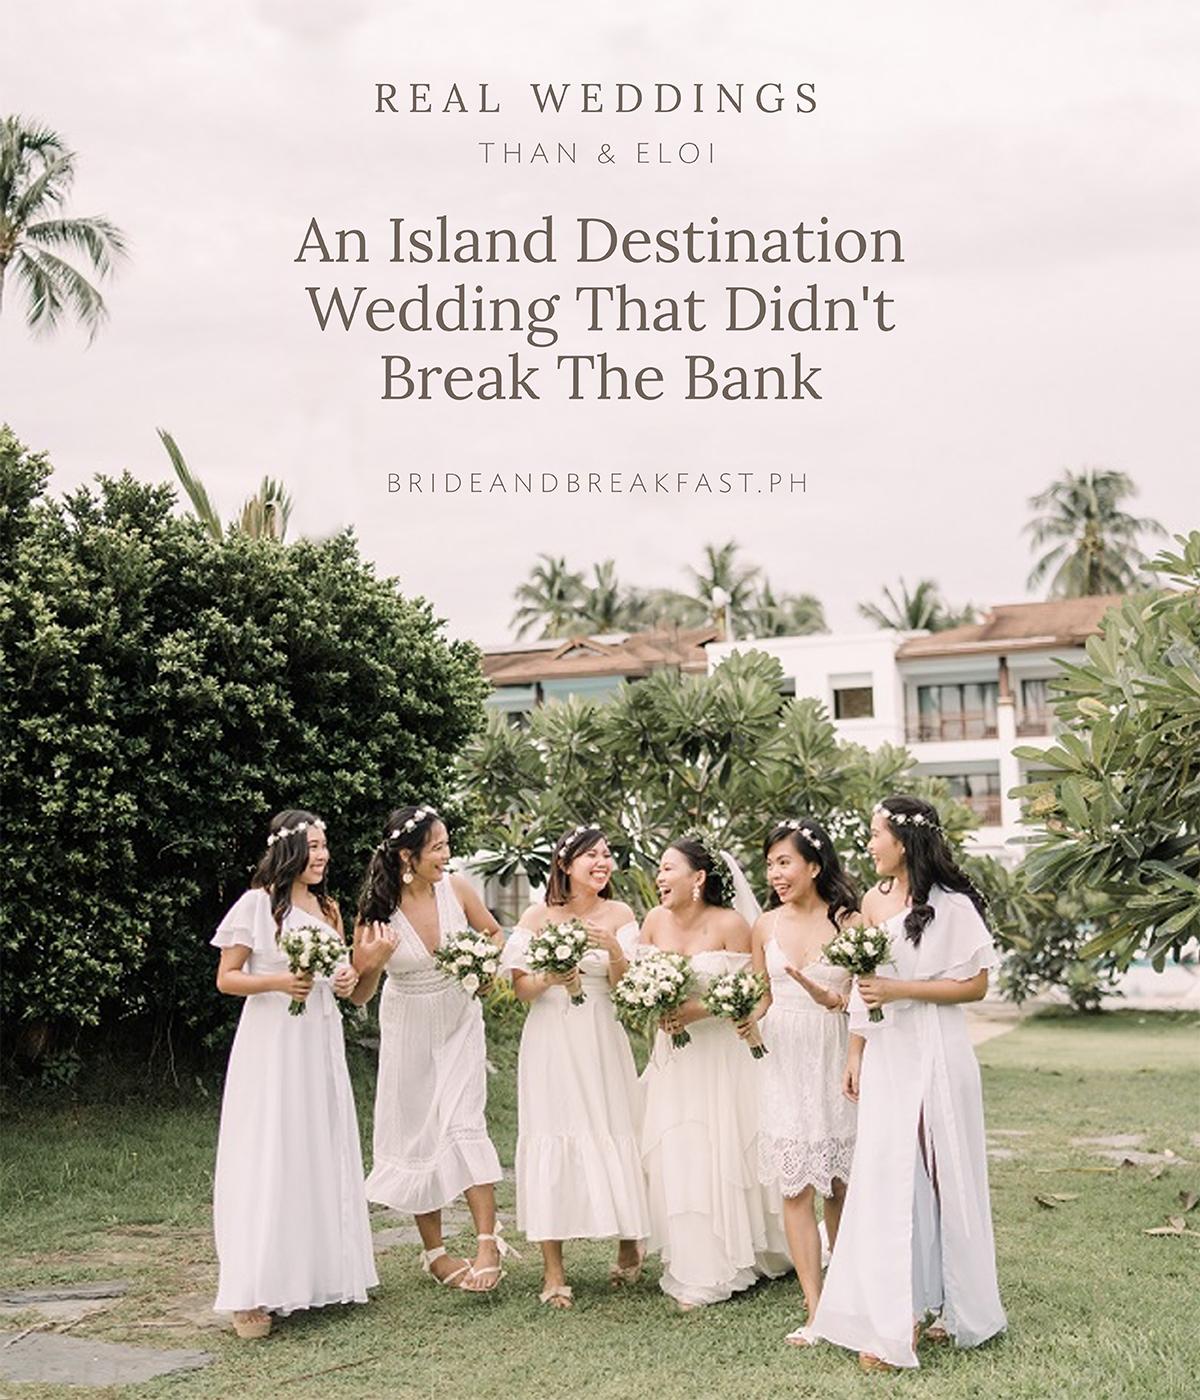 An Island Destination Wedding That Didn't Break The Bank